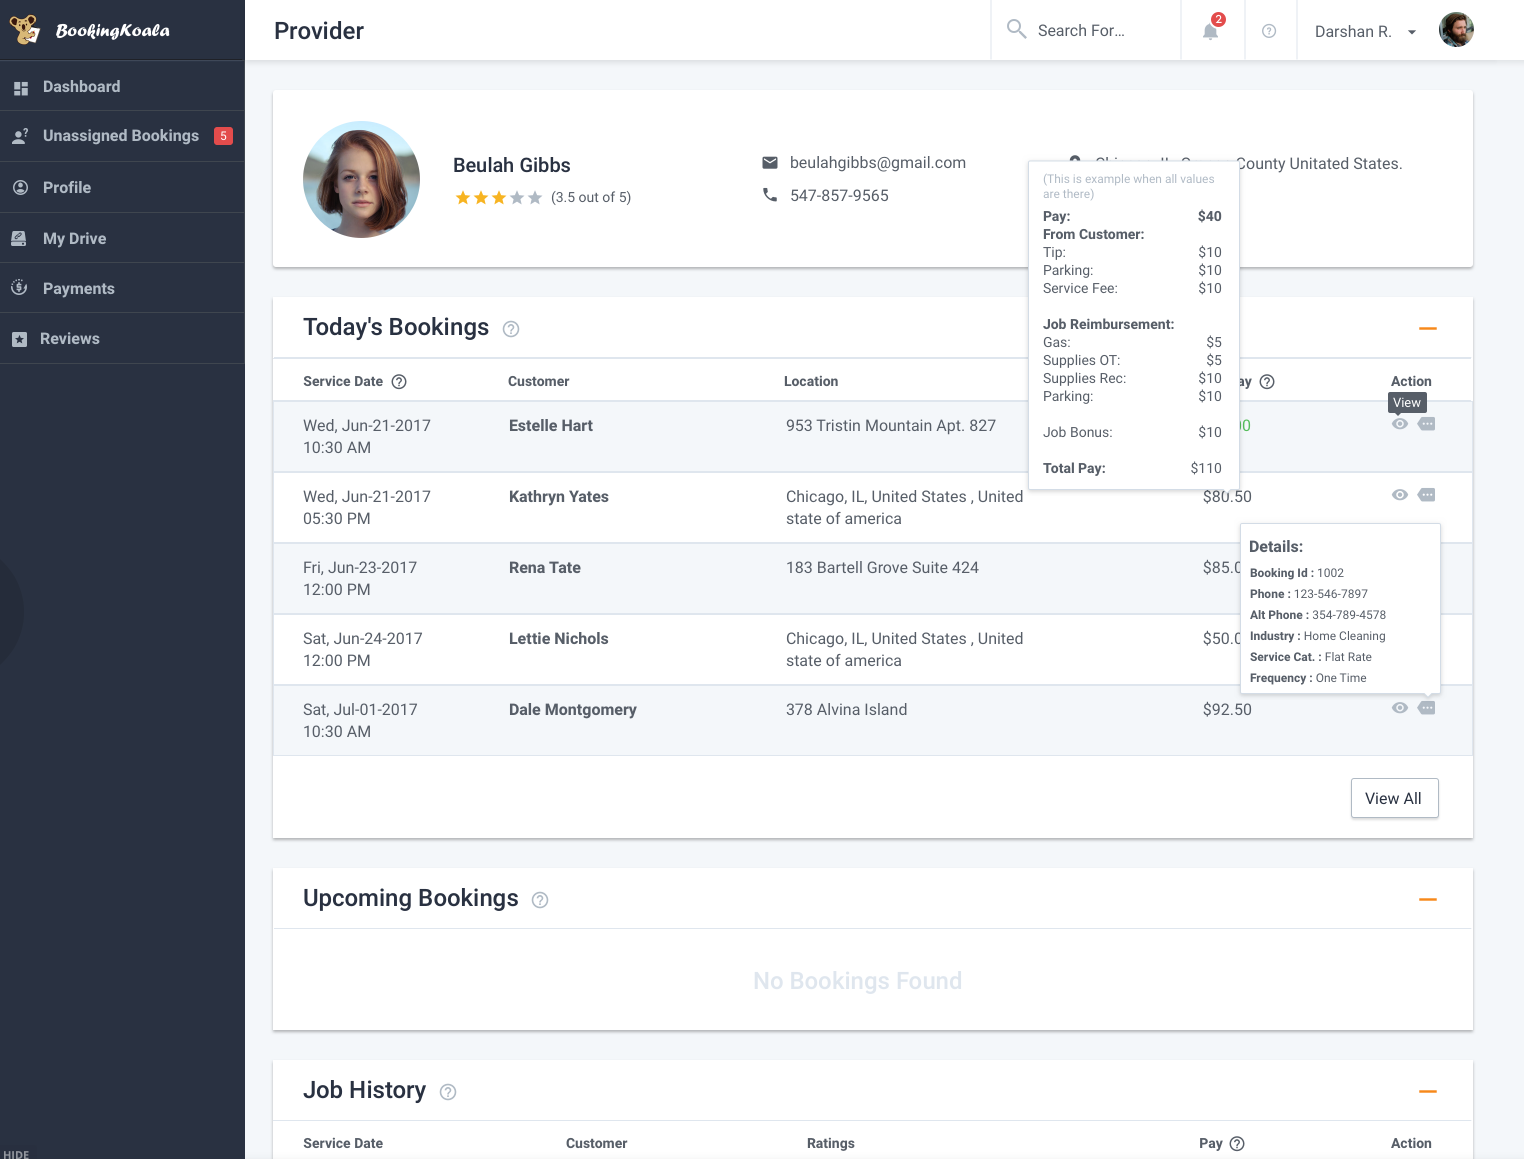 BookingKoala Software - Provider information